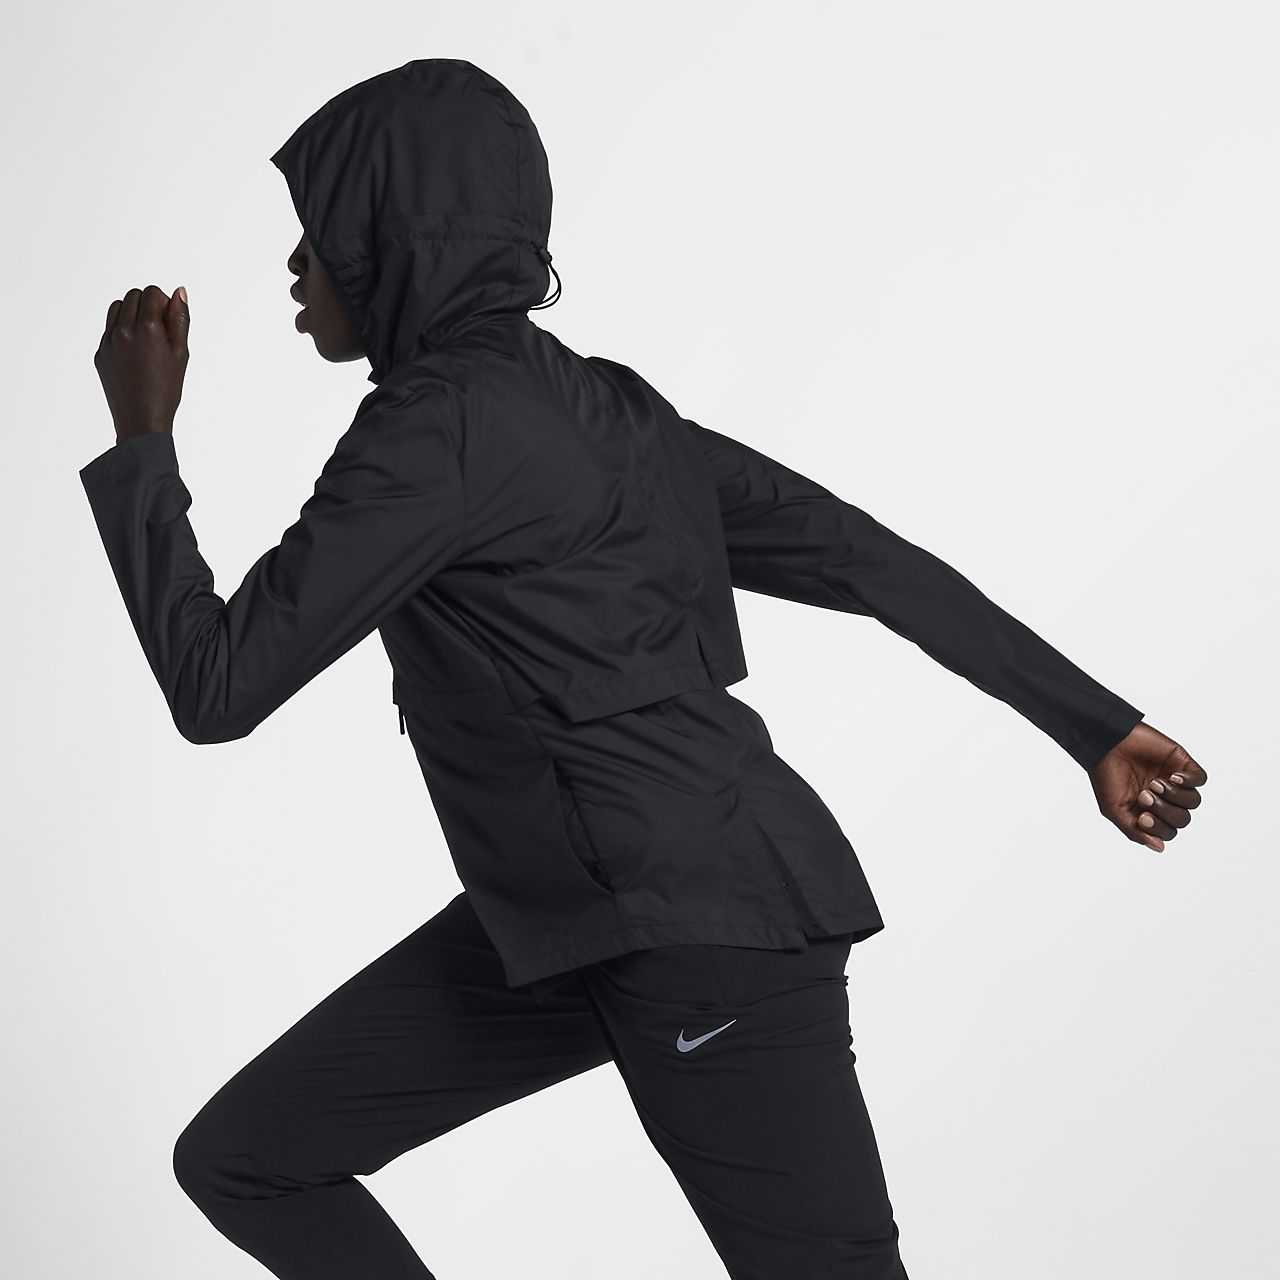 0a3993018cf1 Nike Essential Women s Packable Running Rain Jacket. Nike.com PT